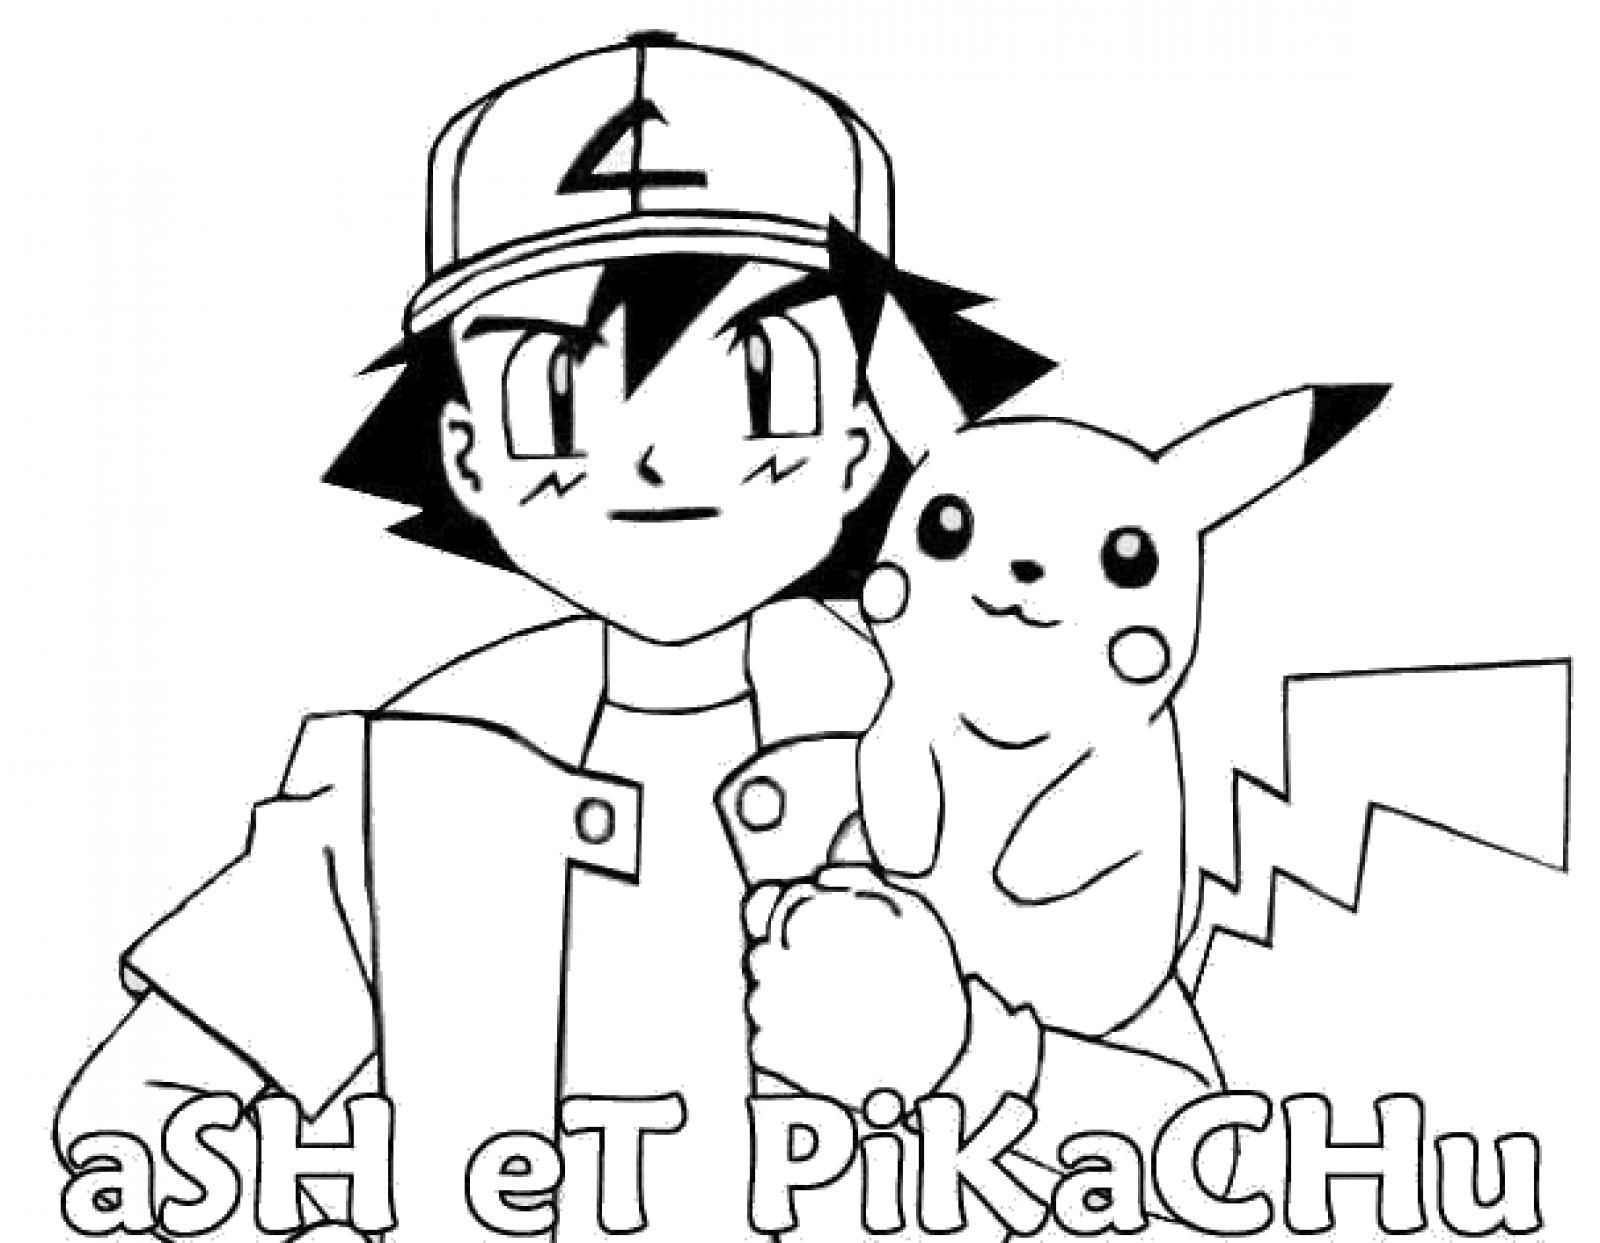 Ash And Pikachu Coloring Page | Pikachu Coloring Page à Coloriage Pikachu